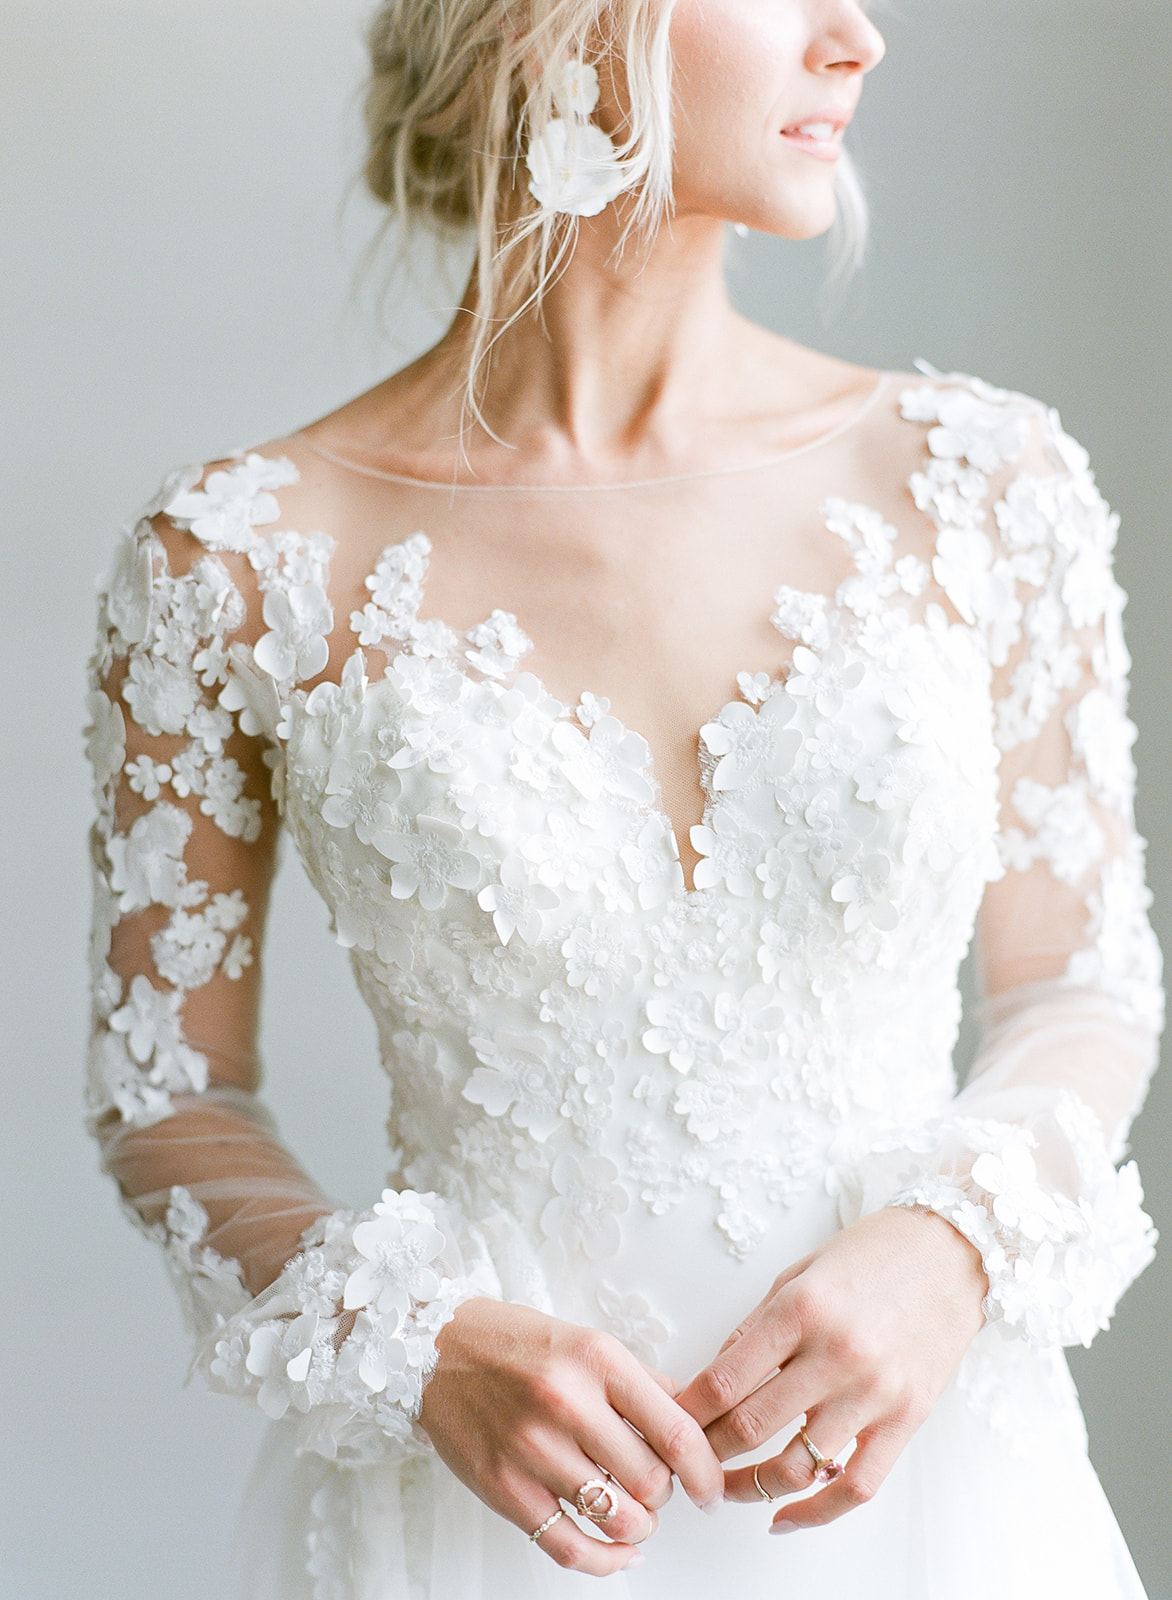 Model Ashlee Jensen Wearing Custom Maggie Sottero Wedding Dress with Illusion Lace Floral Bishop Sleeves